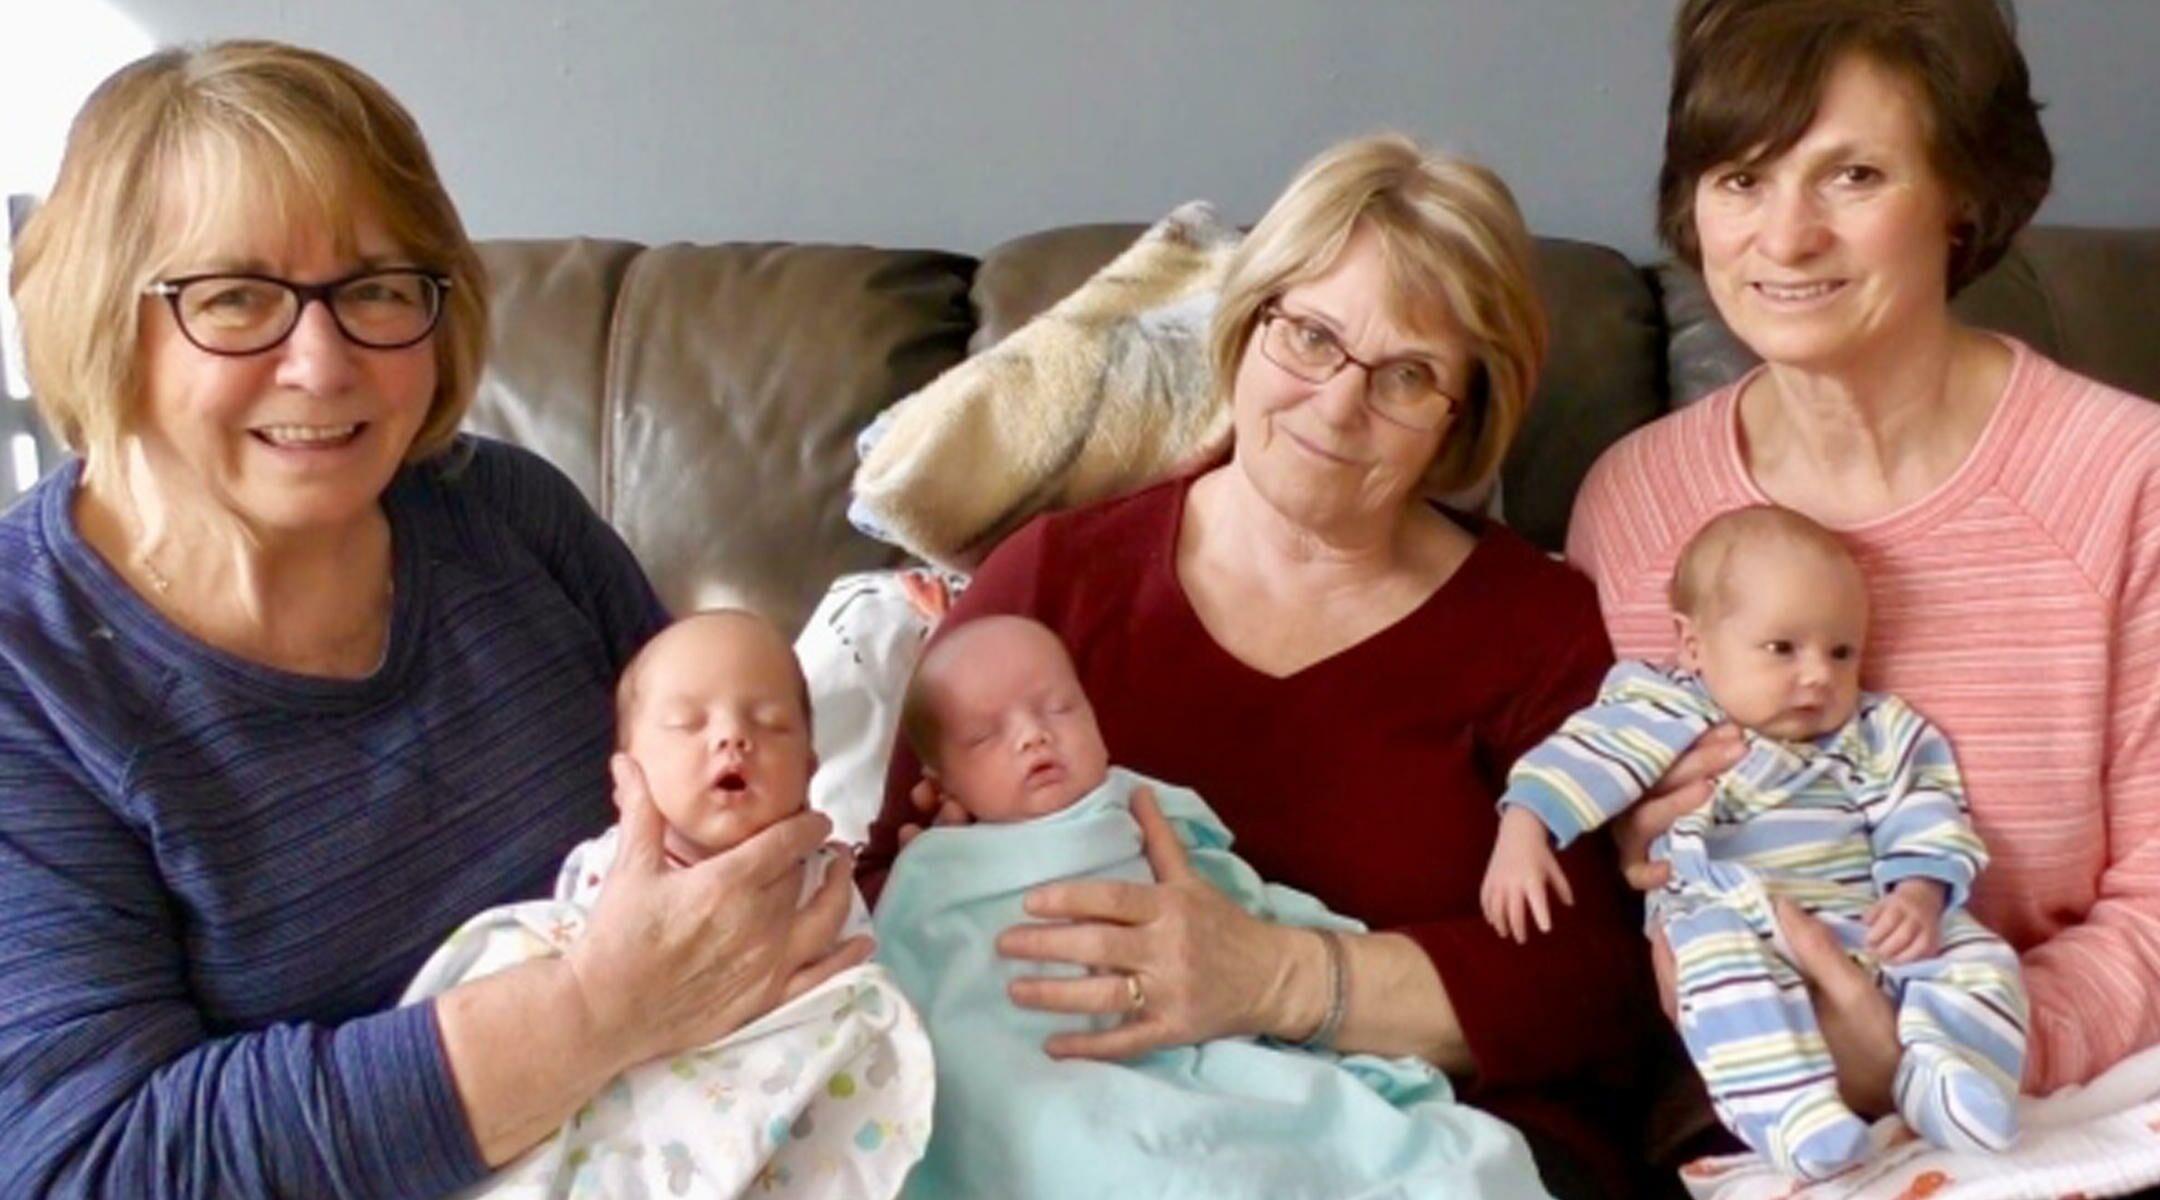 Three 'Grandmas' Answer Single Mom's Plea for Help With Triplets